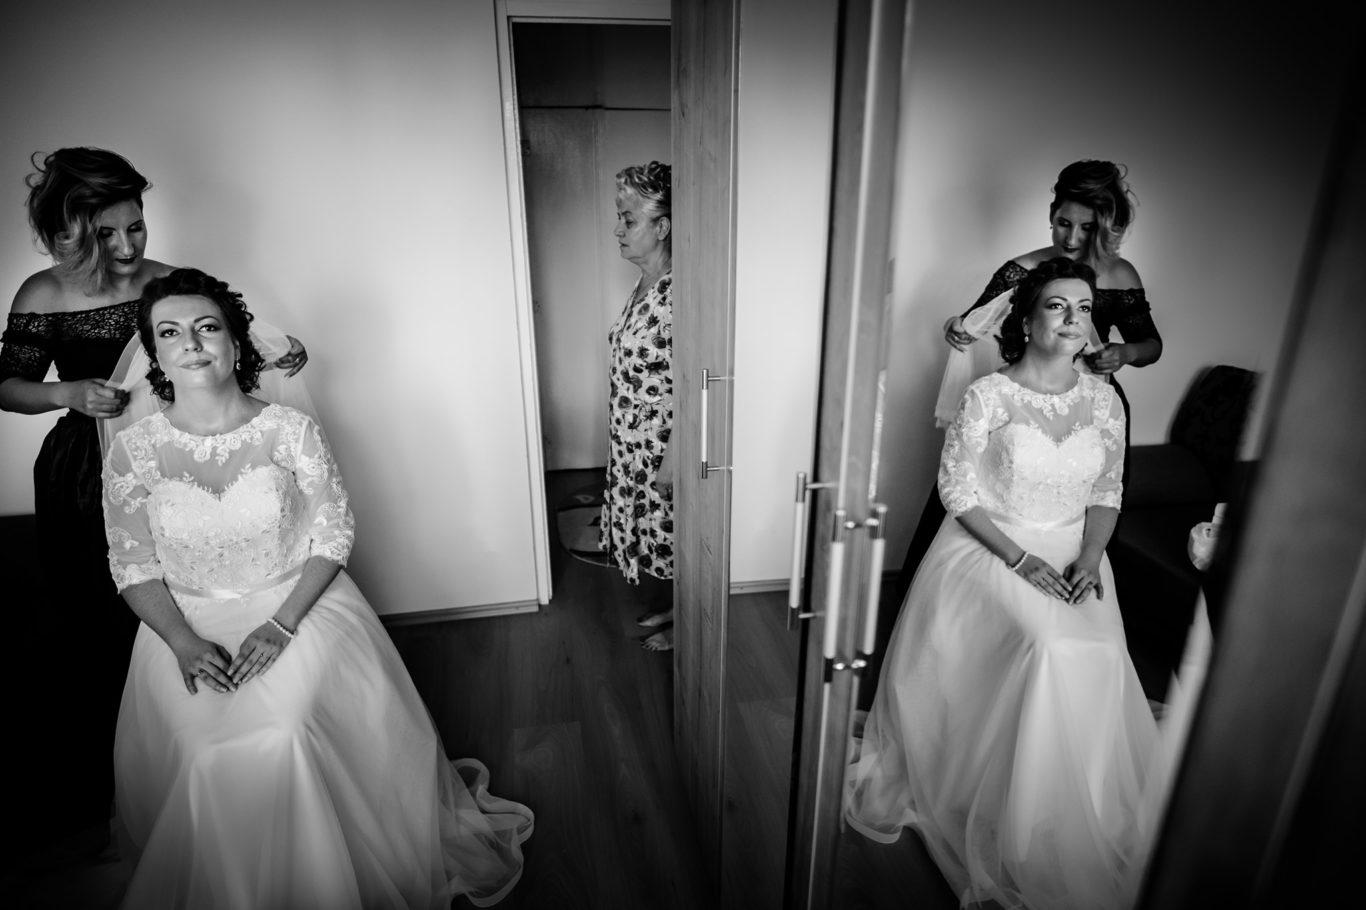 0242-fotografie-nunta-bucuresti-anca-george-fotograf-ciprian-dumitrescu-dsc_8212